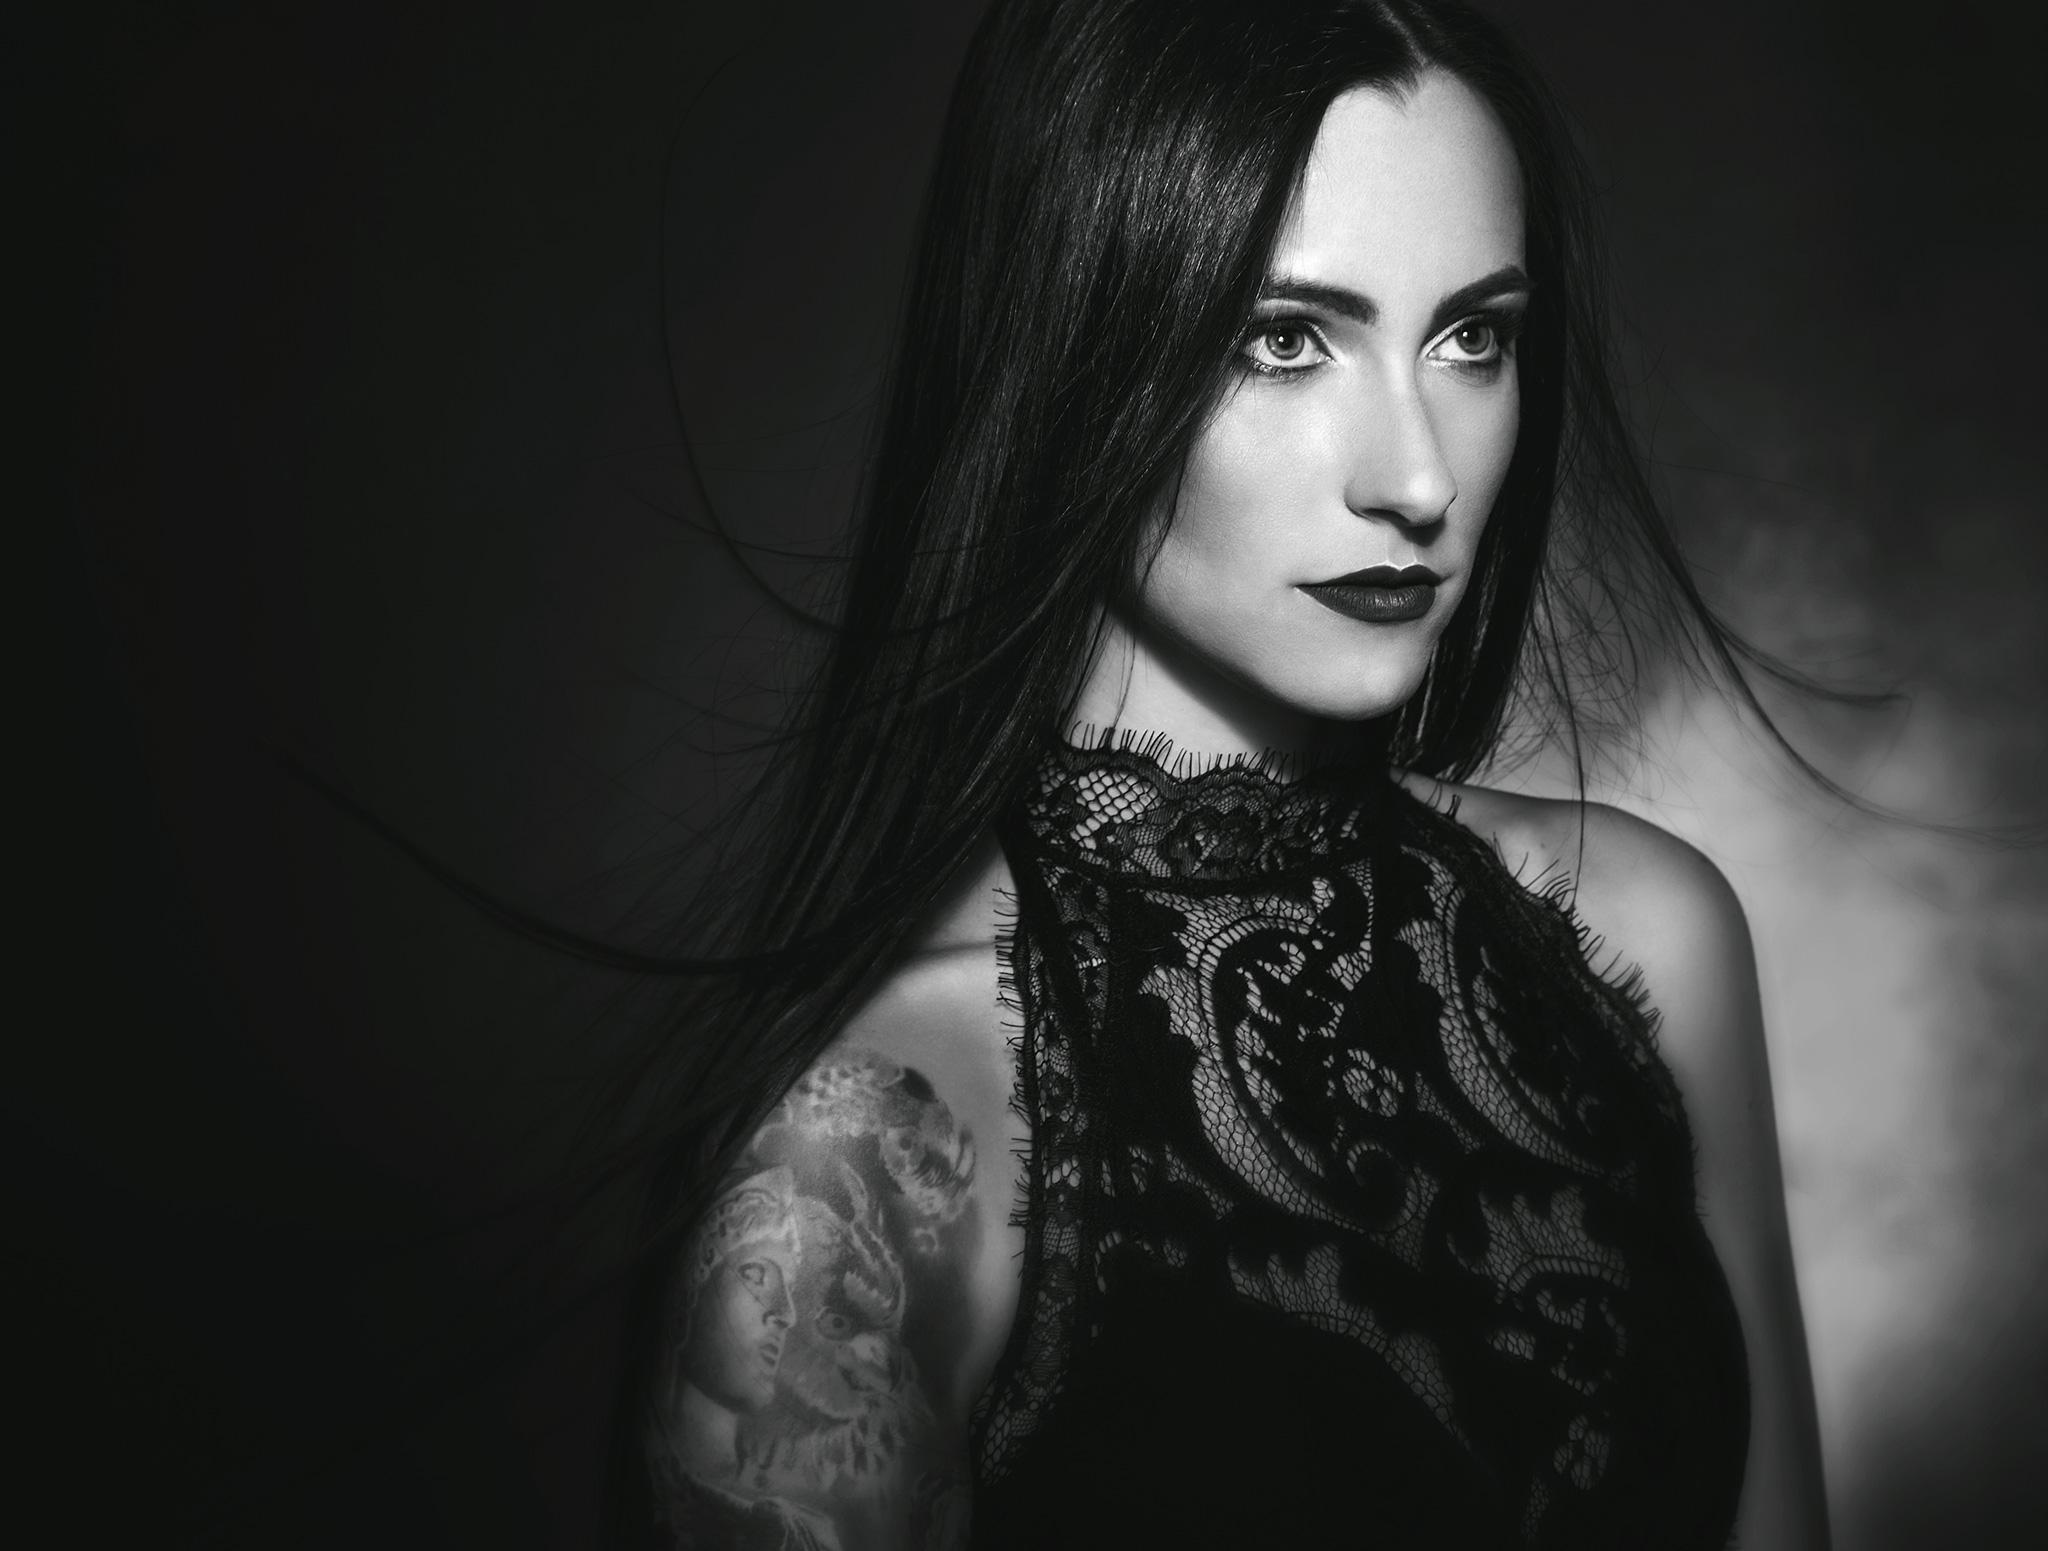 Diva Satánica